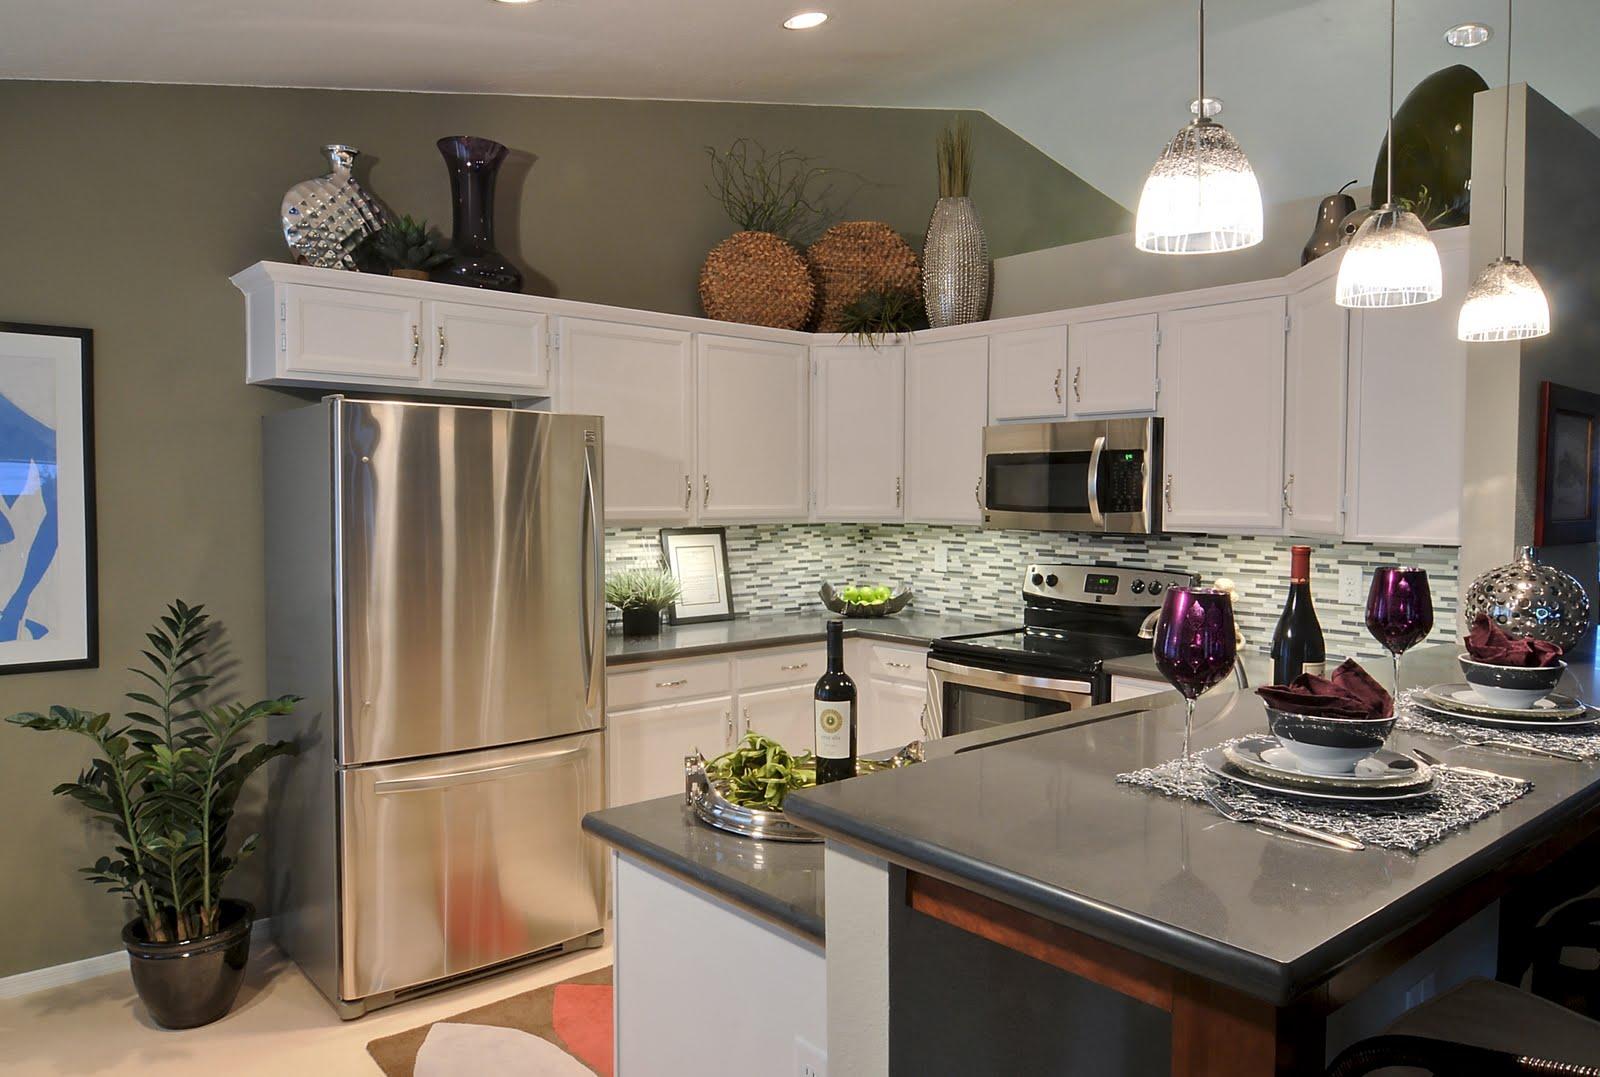 Budget Kitchen Remodel!   Interior Design|Decorator|Home Remodel|Scottsdale|Phoenix  AZ